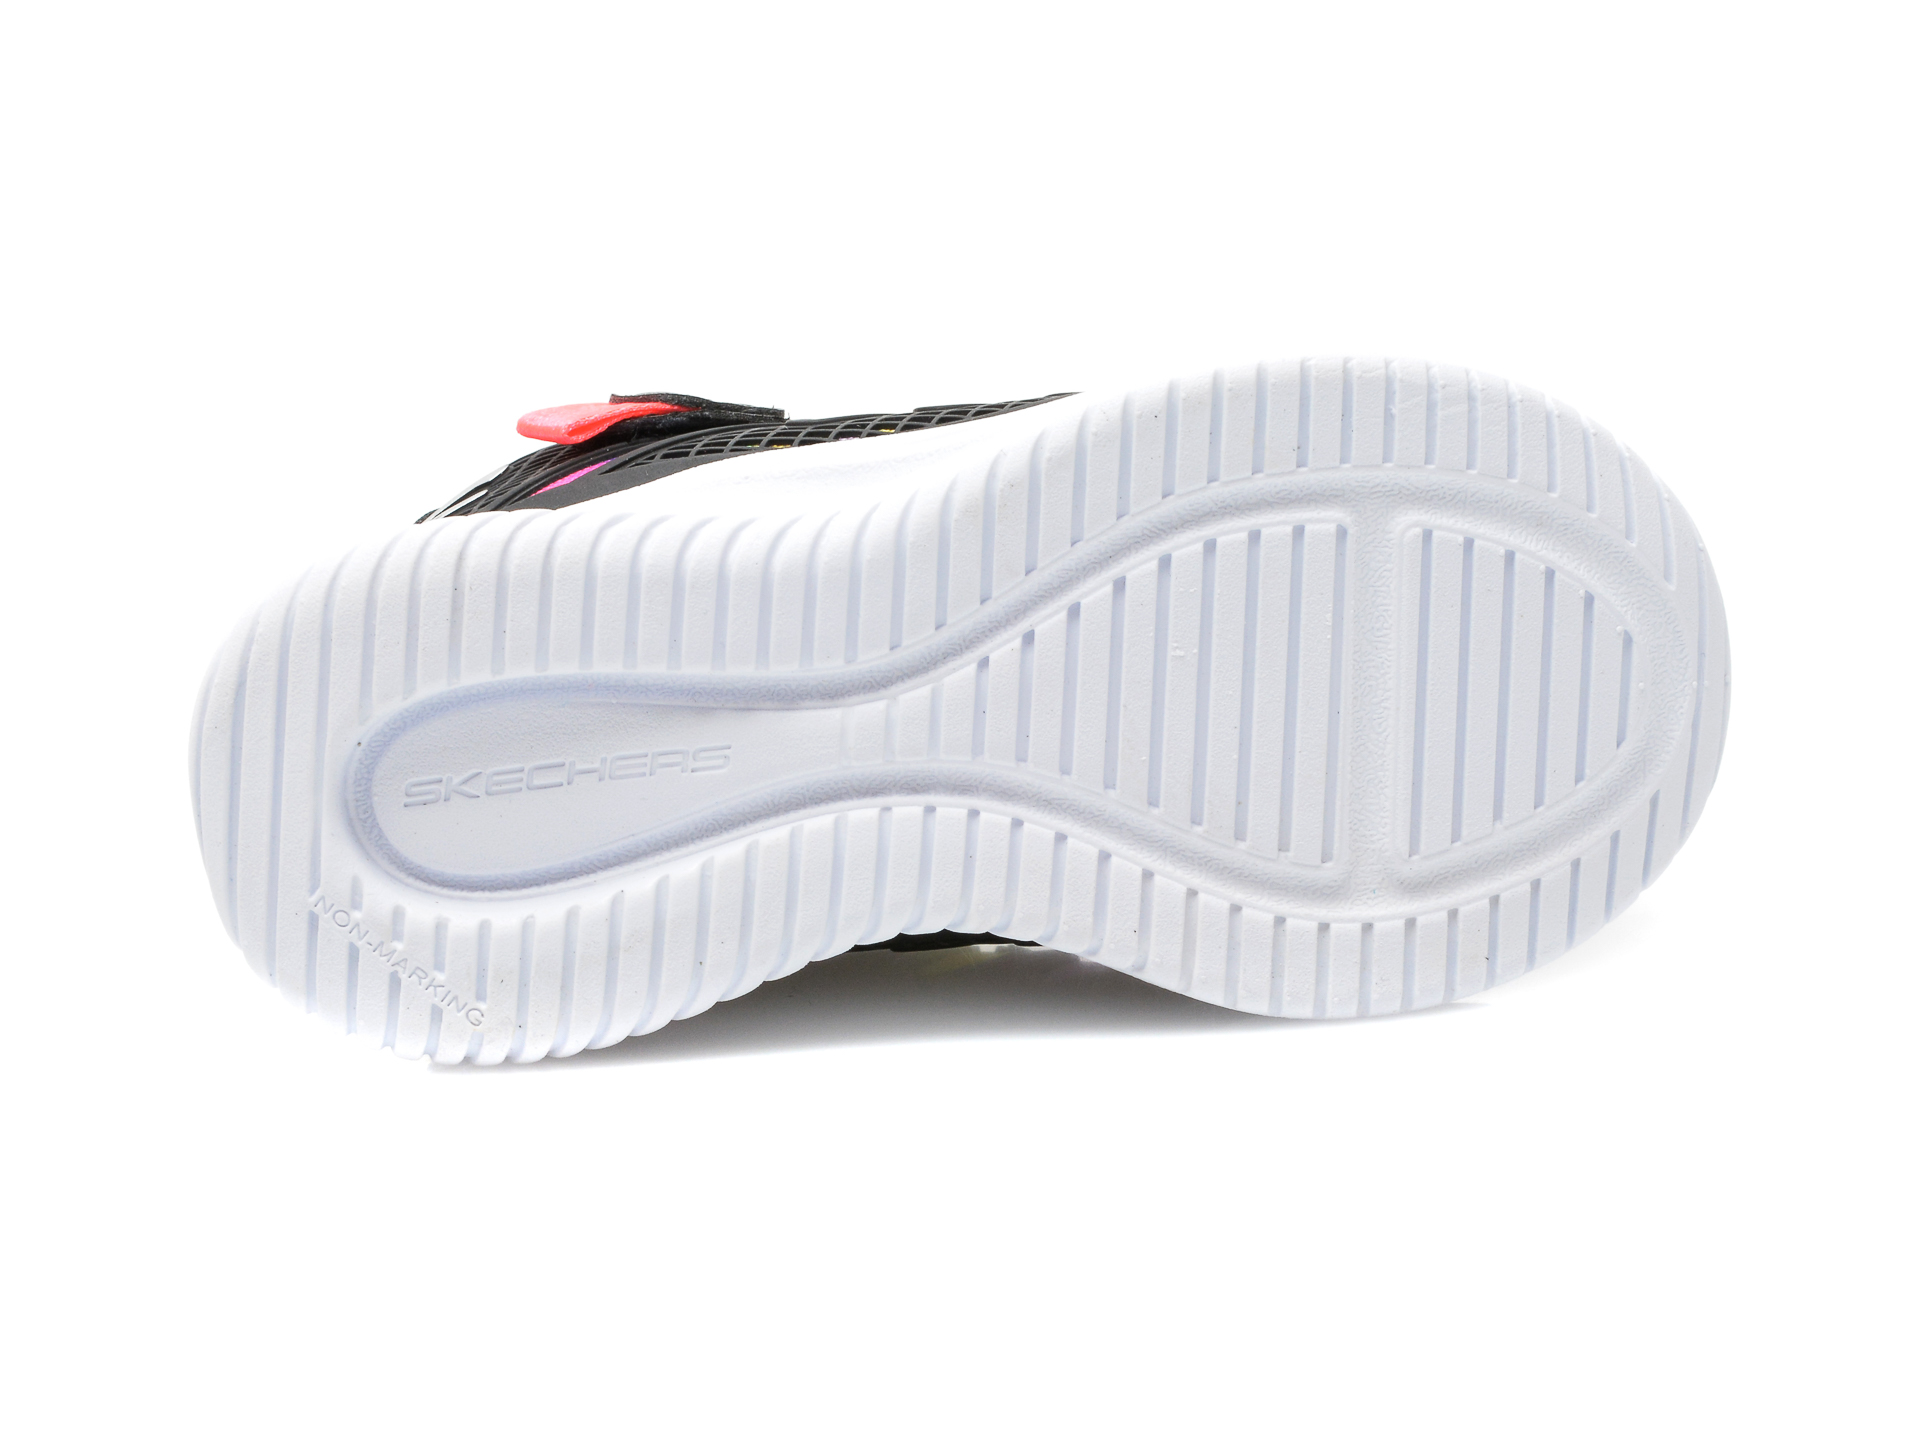 Pantofi sport SKECHERS negri, JUMPSTERS, din piele ecologica - 7